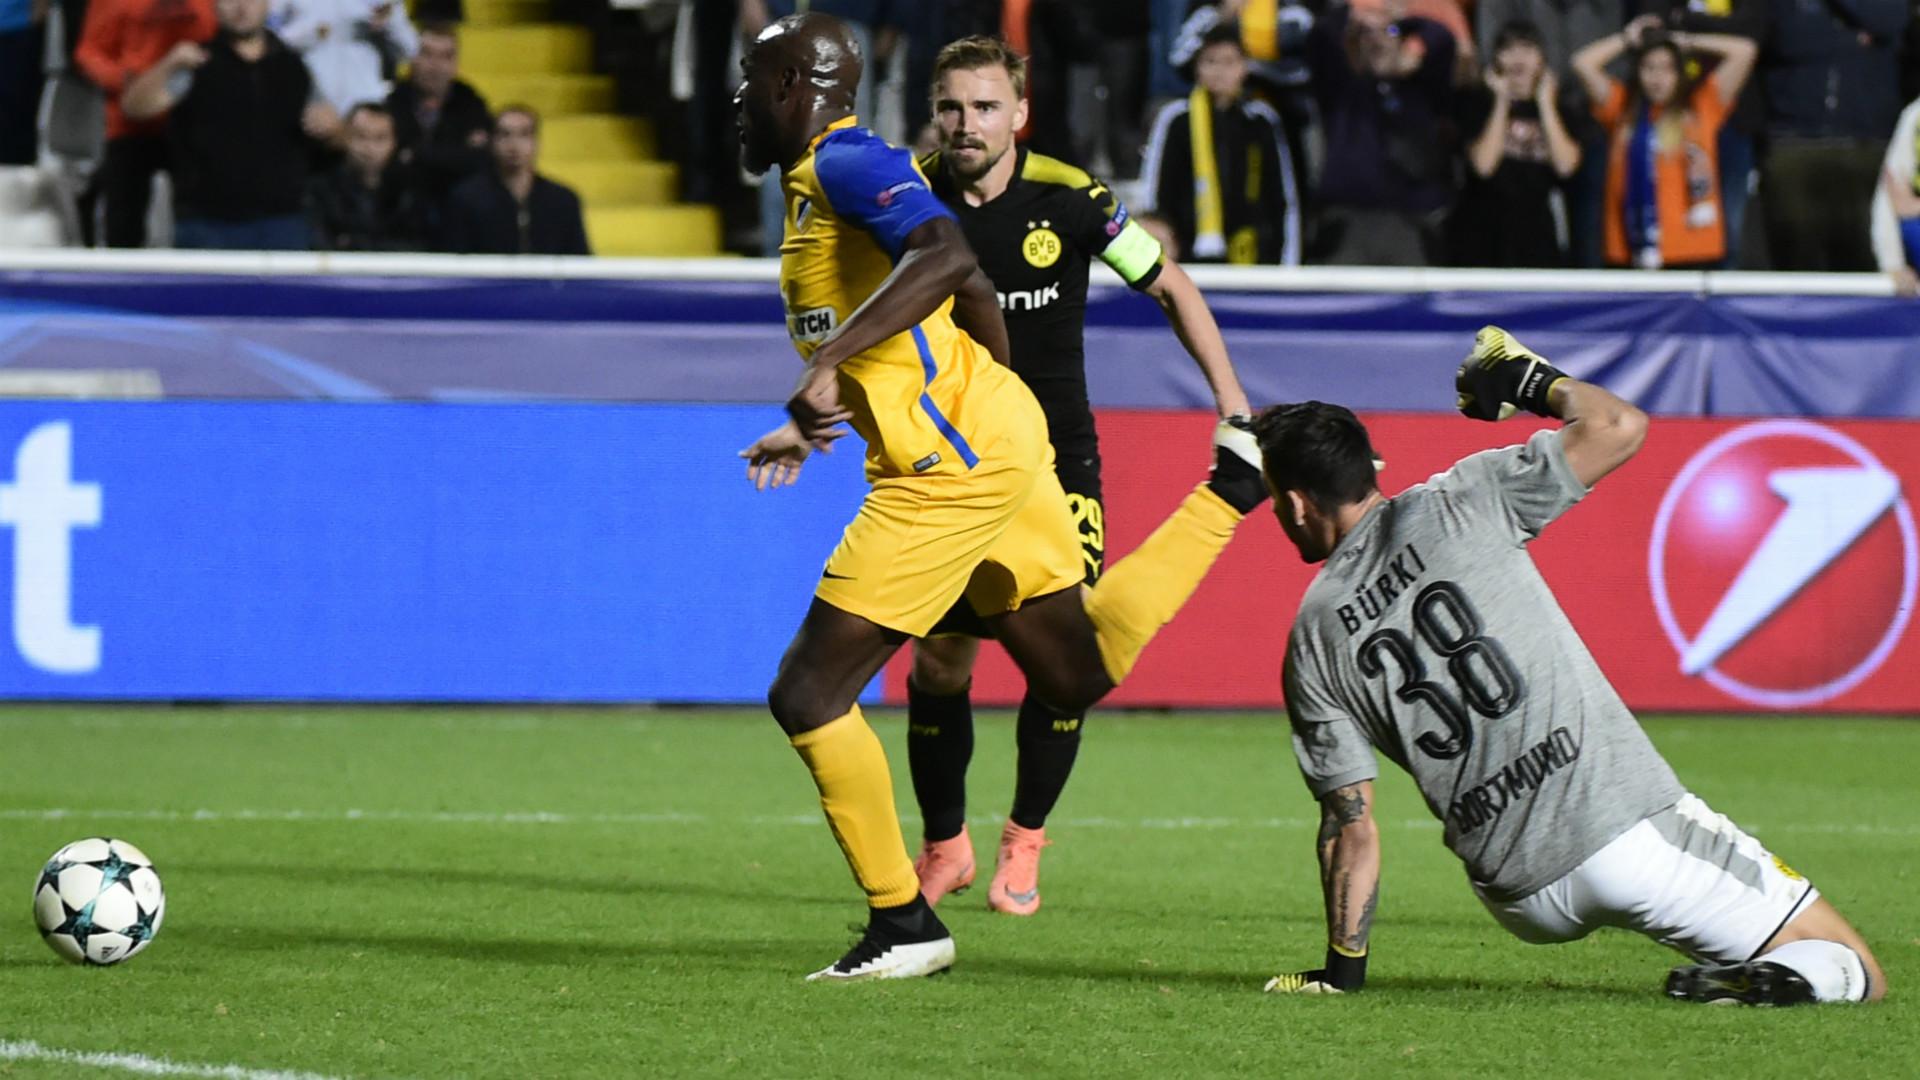 Roman Burki APOEL Borussia Dortmund Champions League 17102017